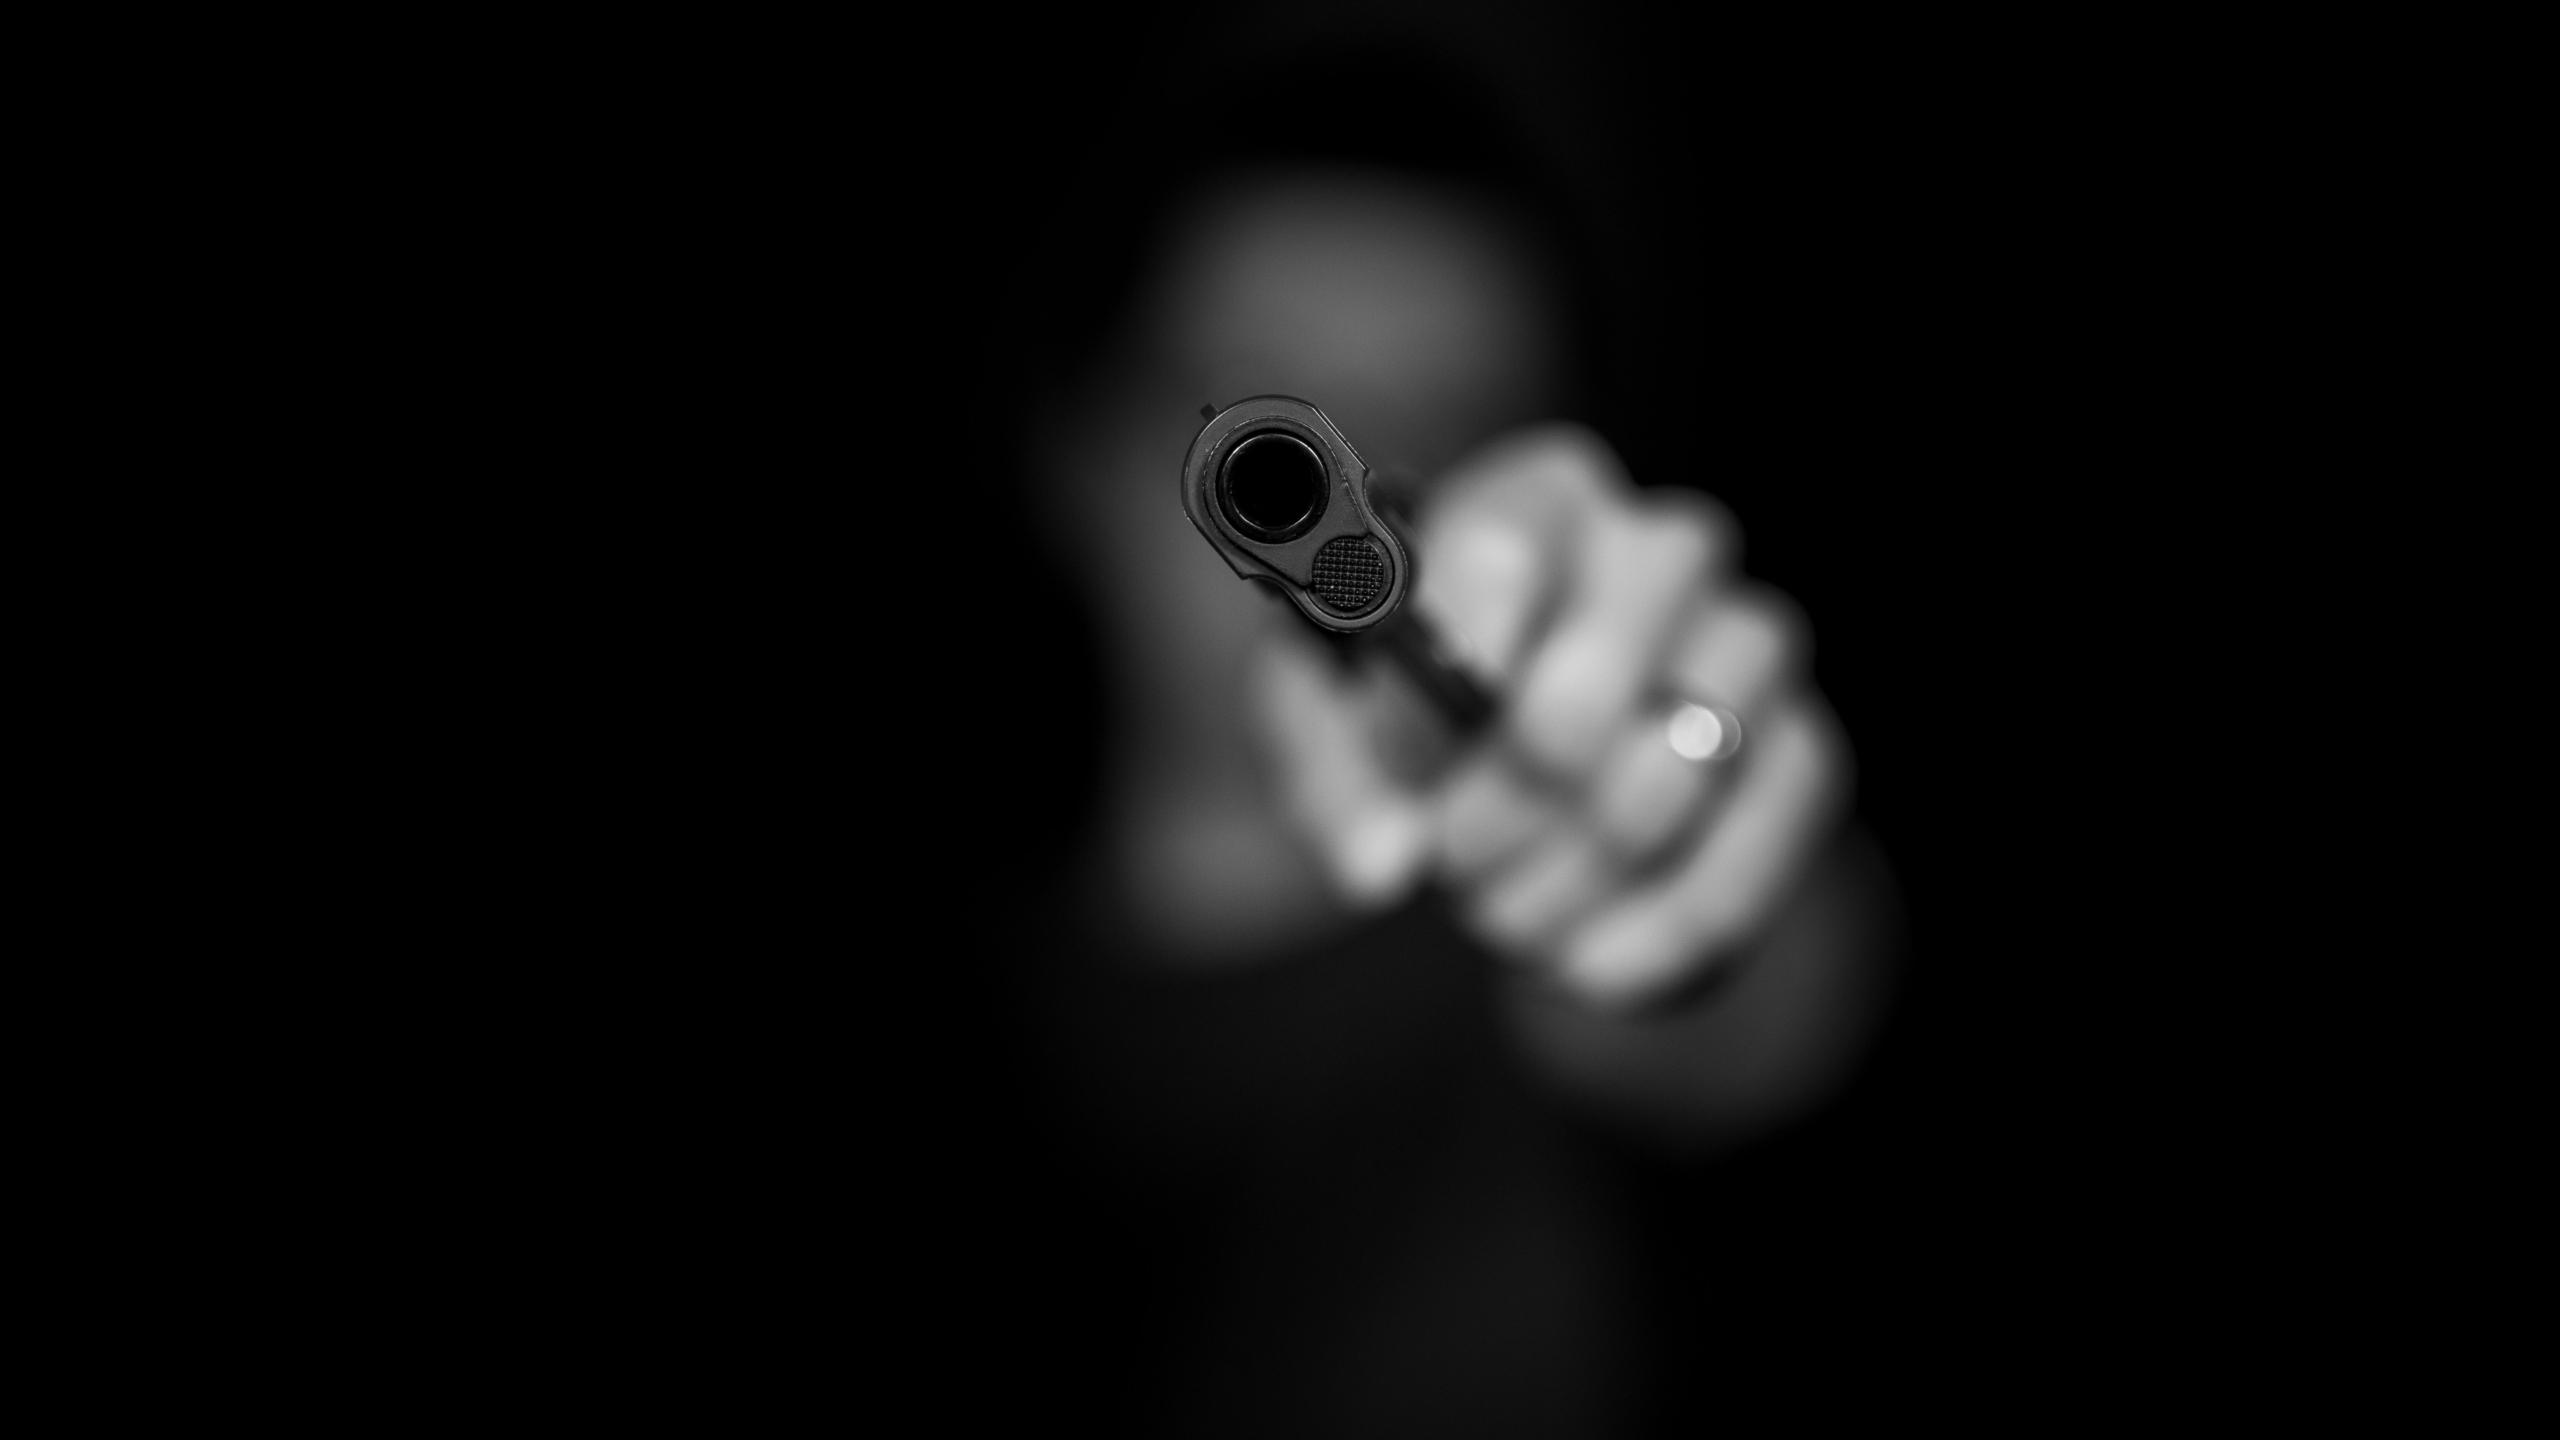 Shots Fired Last Night Near Downtown's Powerhouse Arts District